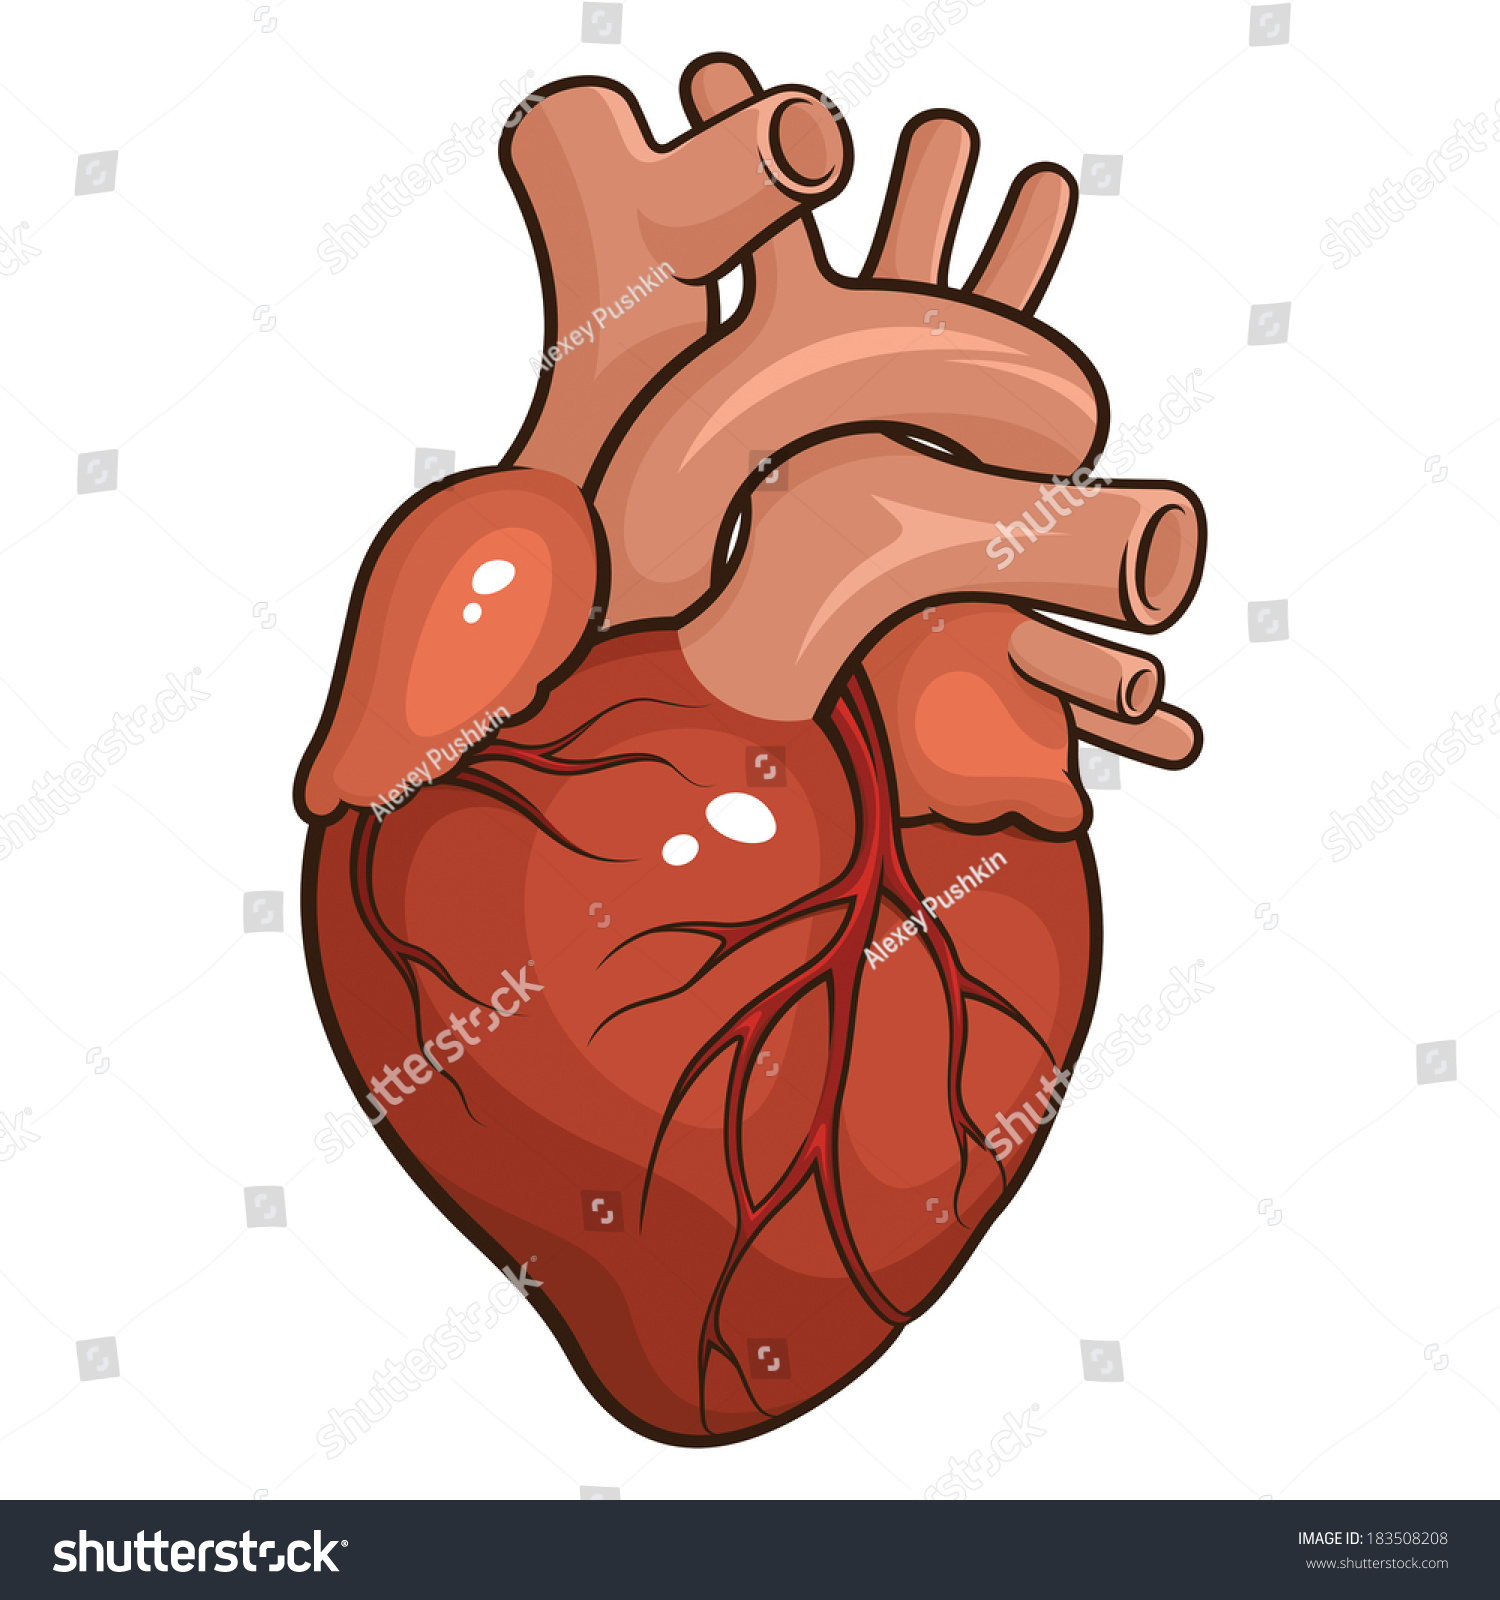 Vector Illustration Human Heart Isolated On Stock Vector Royalty